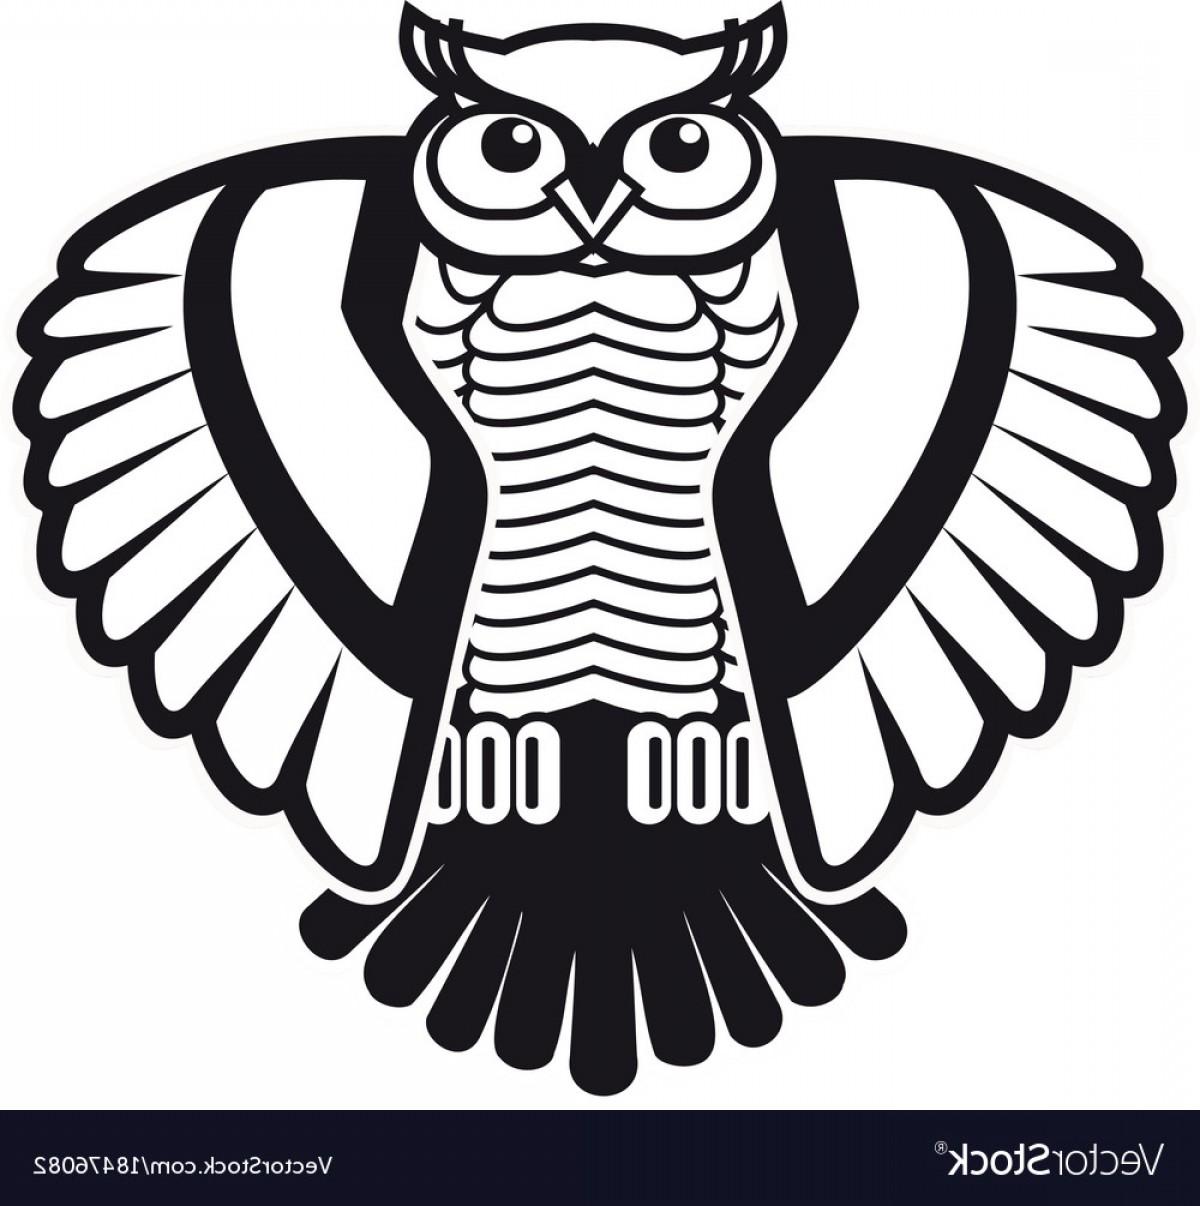 1200x1206 Owl Vector Design Soidergi